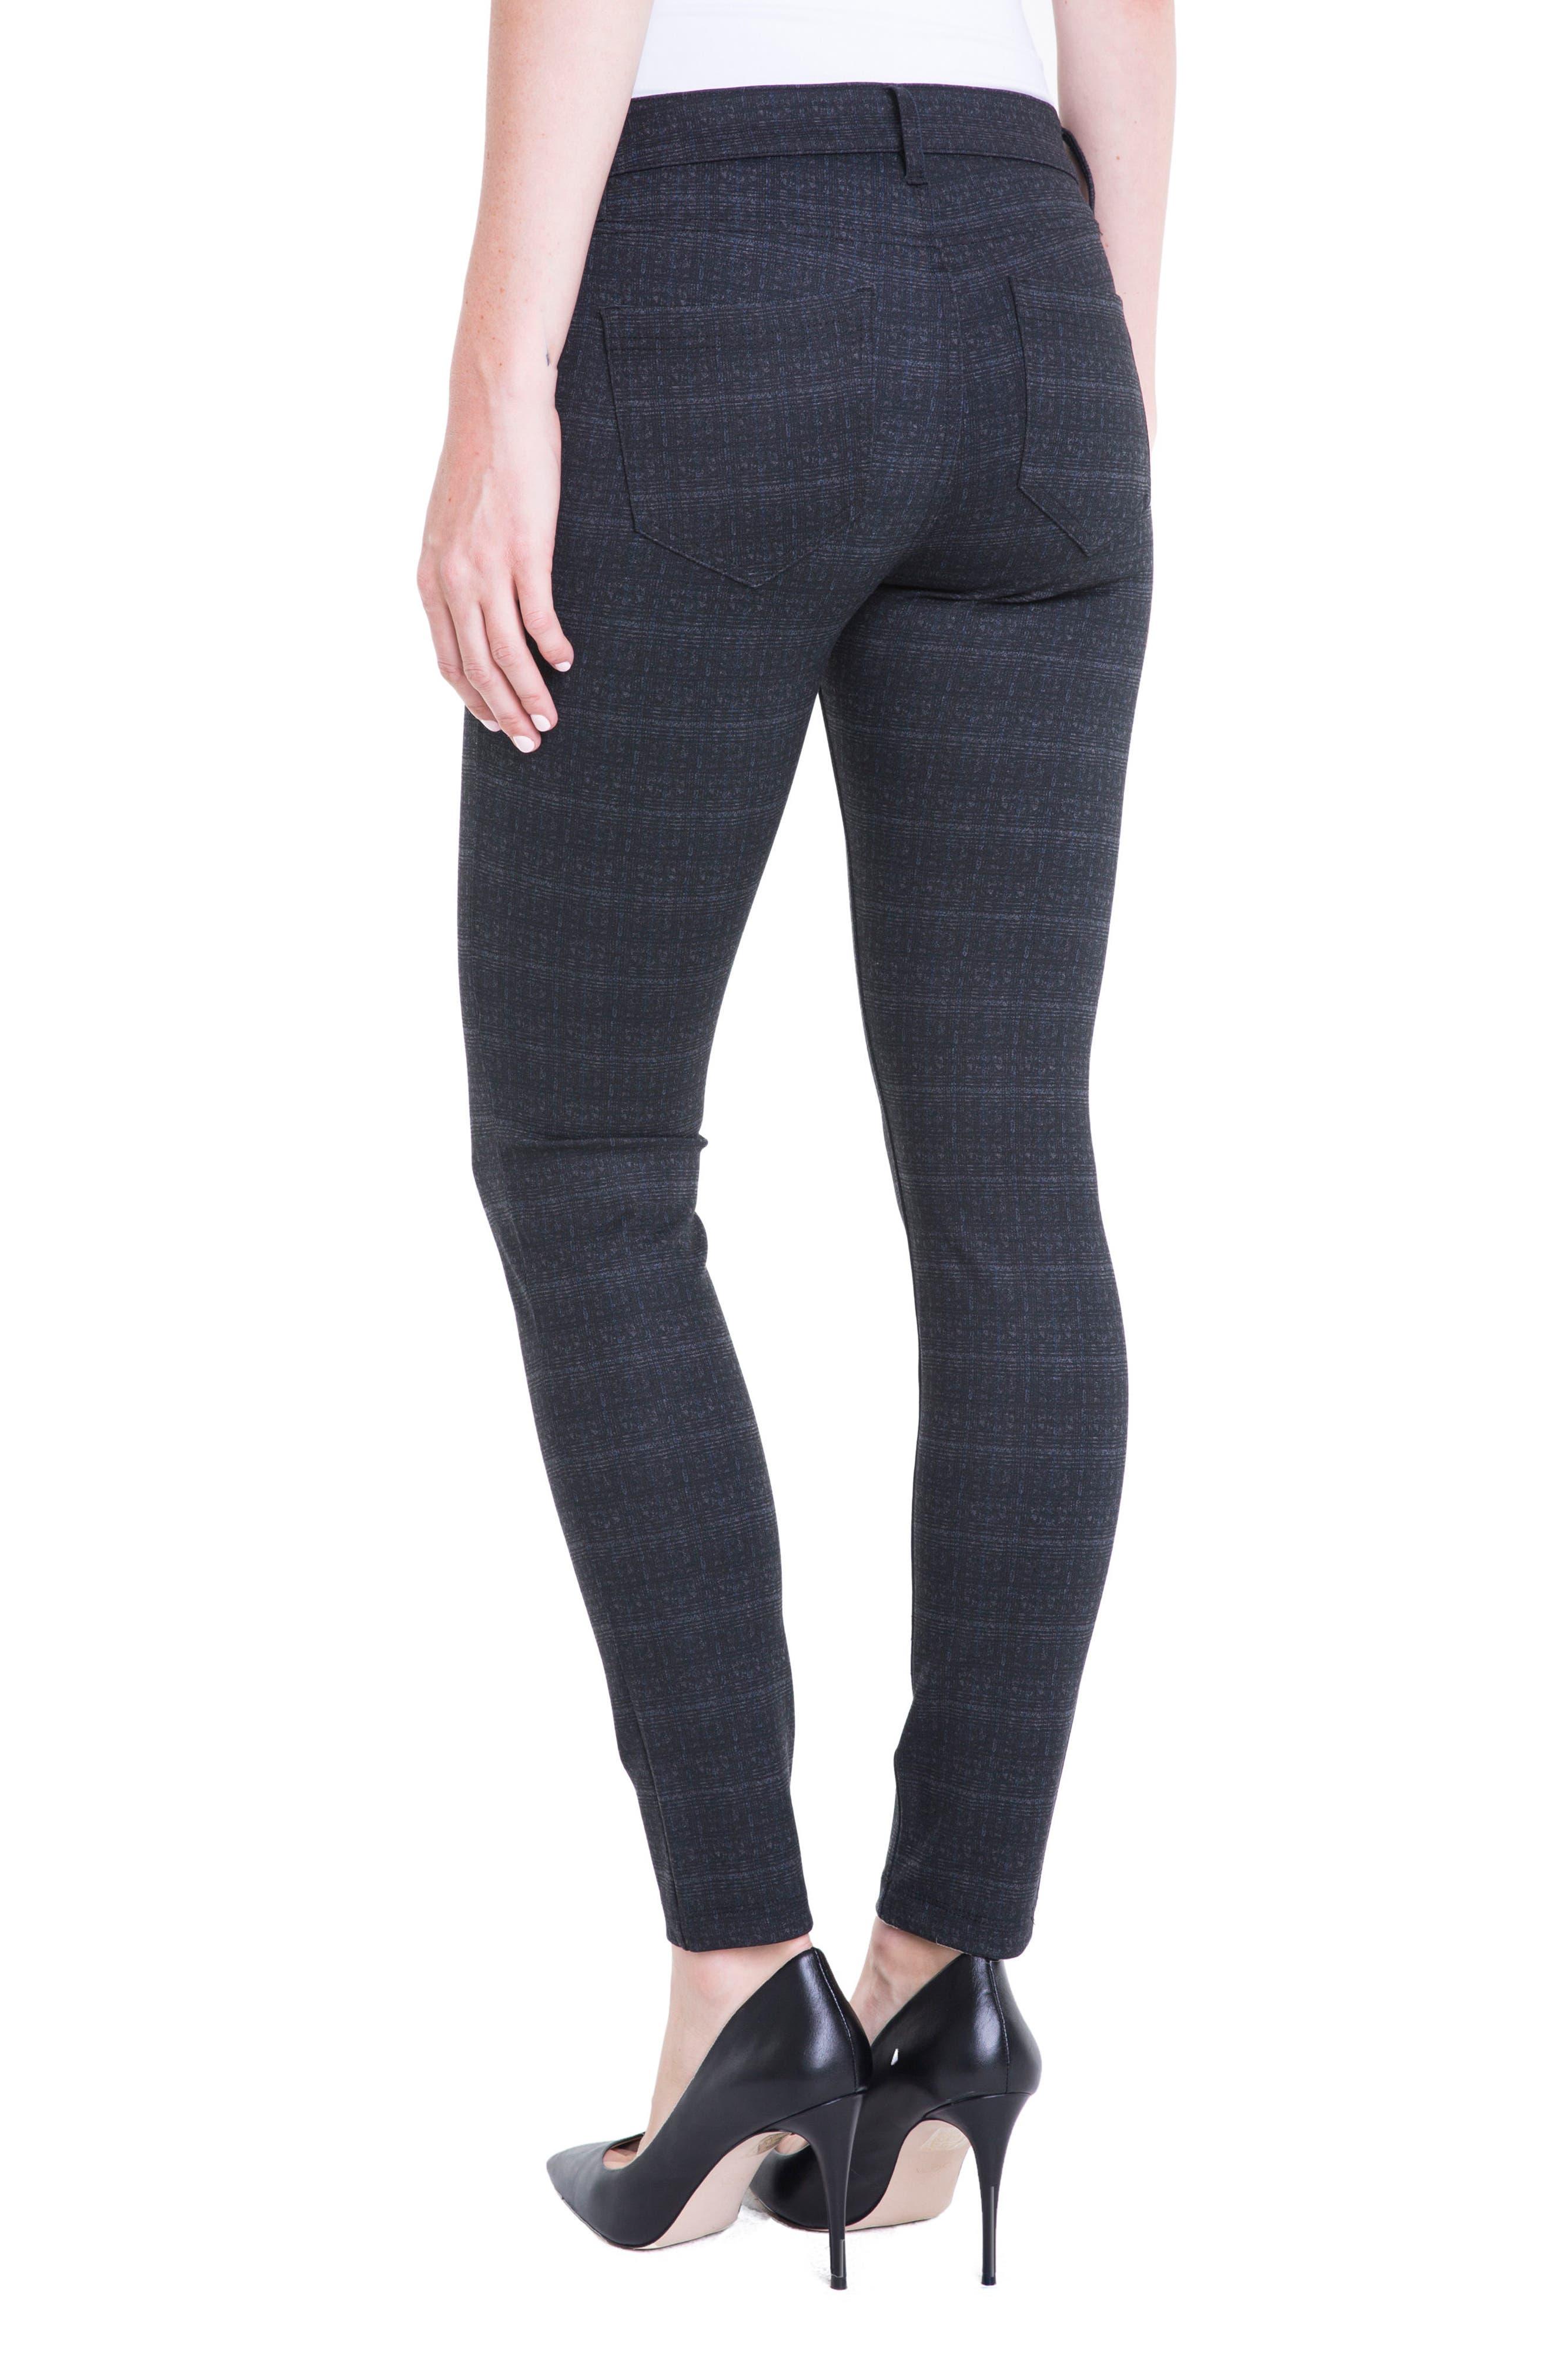 Plaid Super Skinny Ponte Knit Pants,                             Alternate thumbnail 2, color,                             022